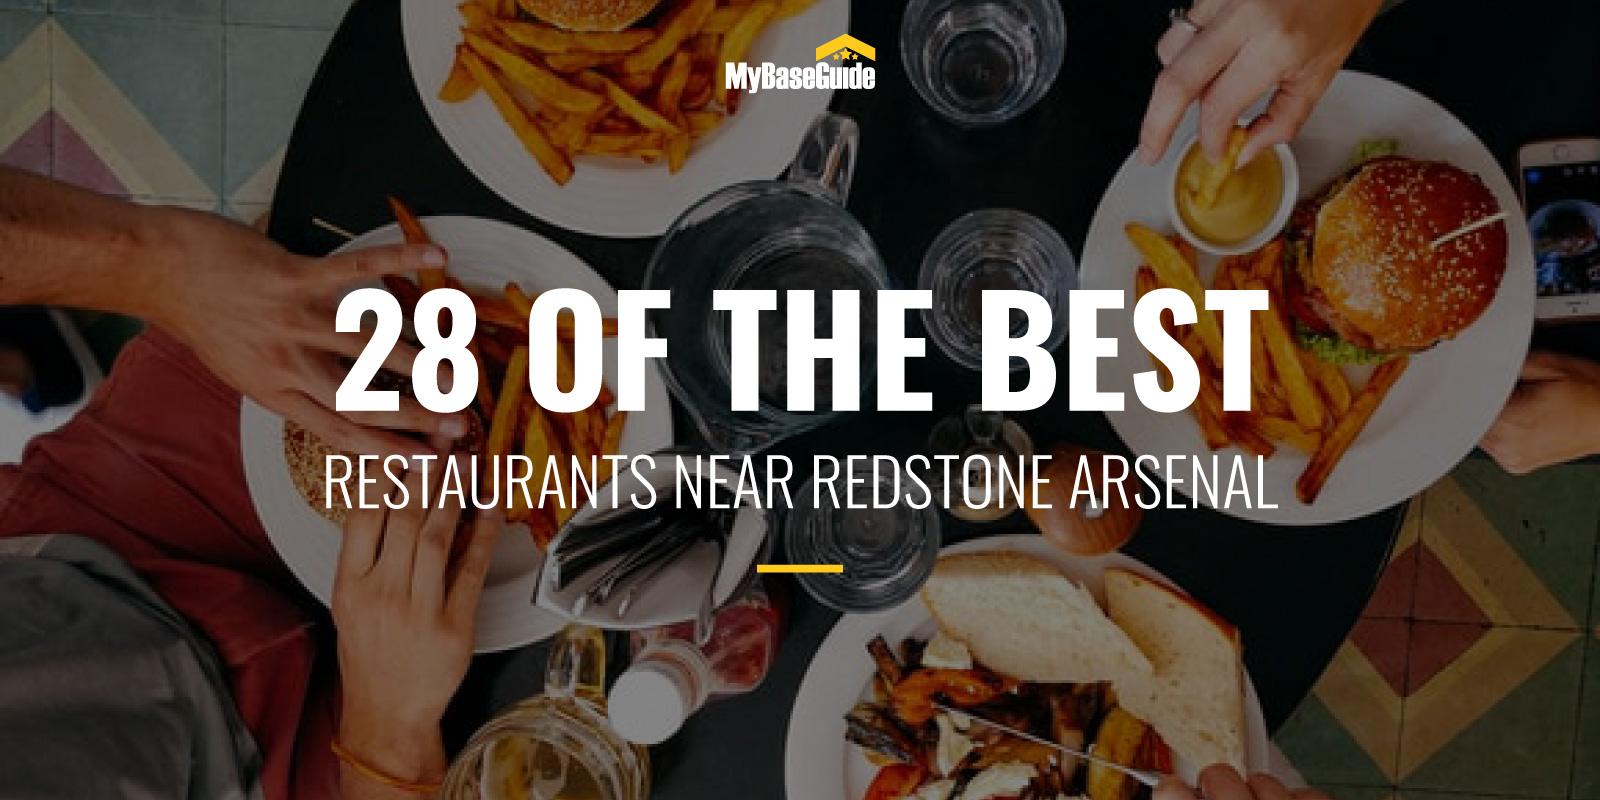 28 of the Best Restaurants Near Redstone Arsenal